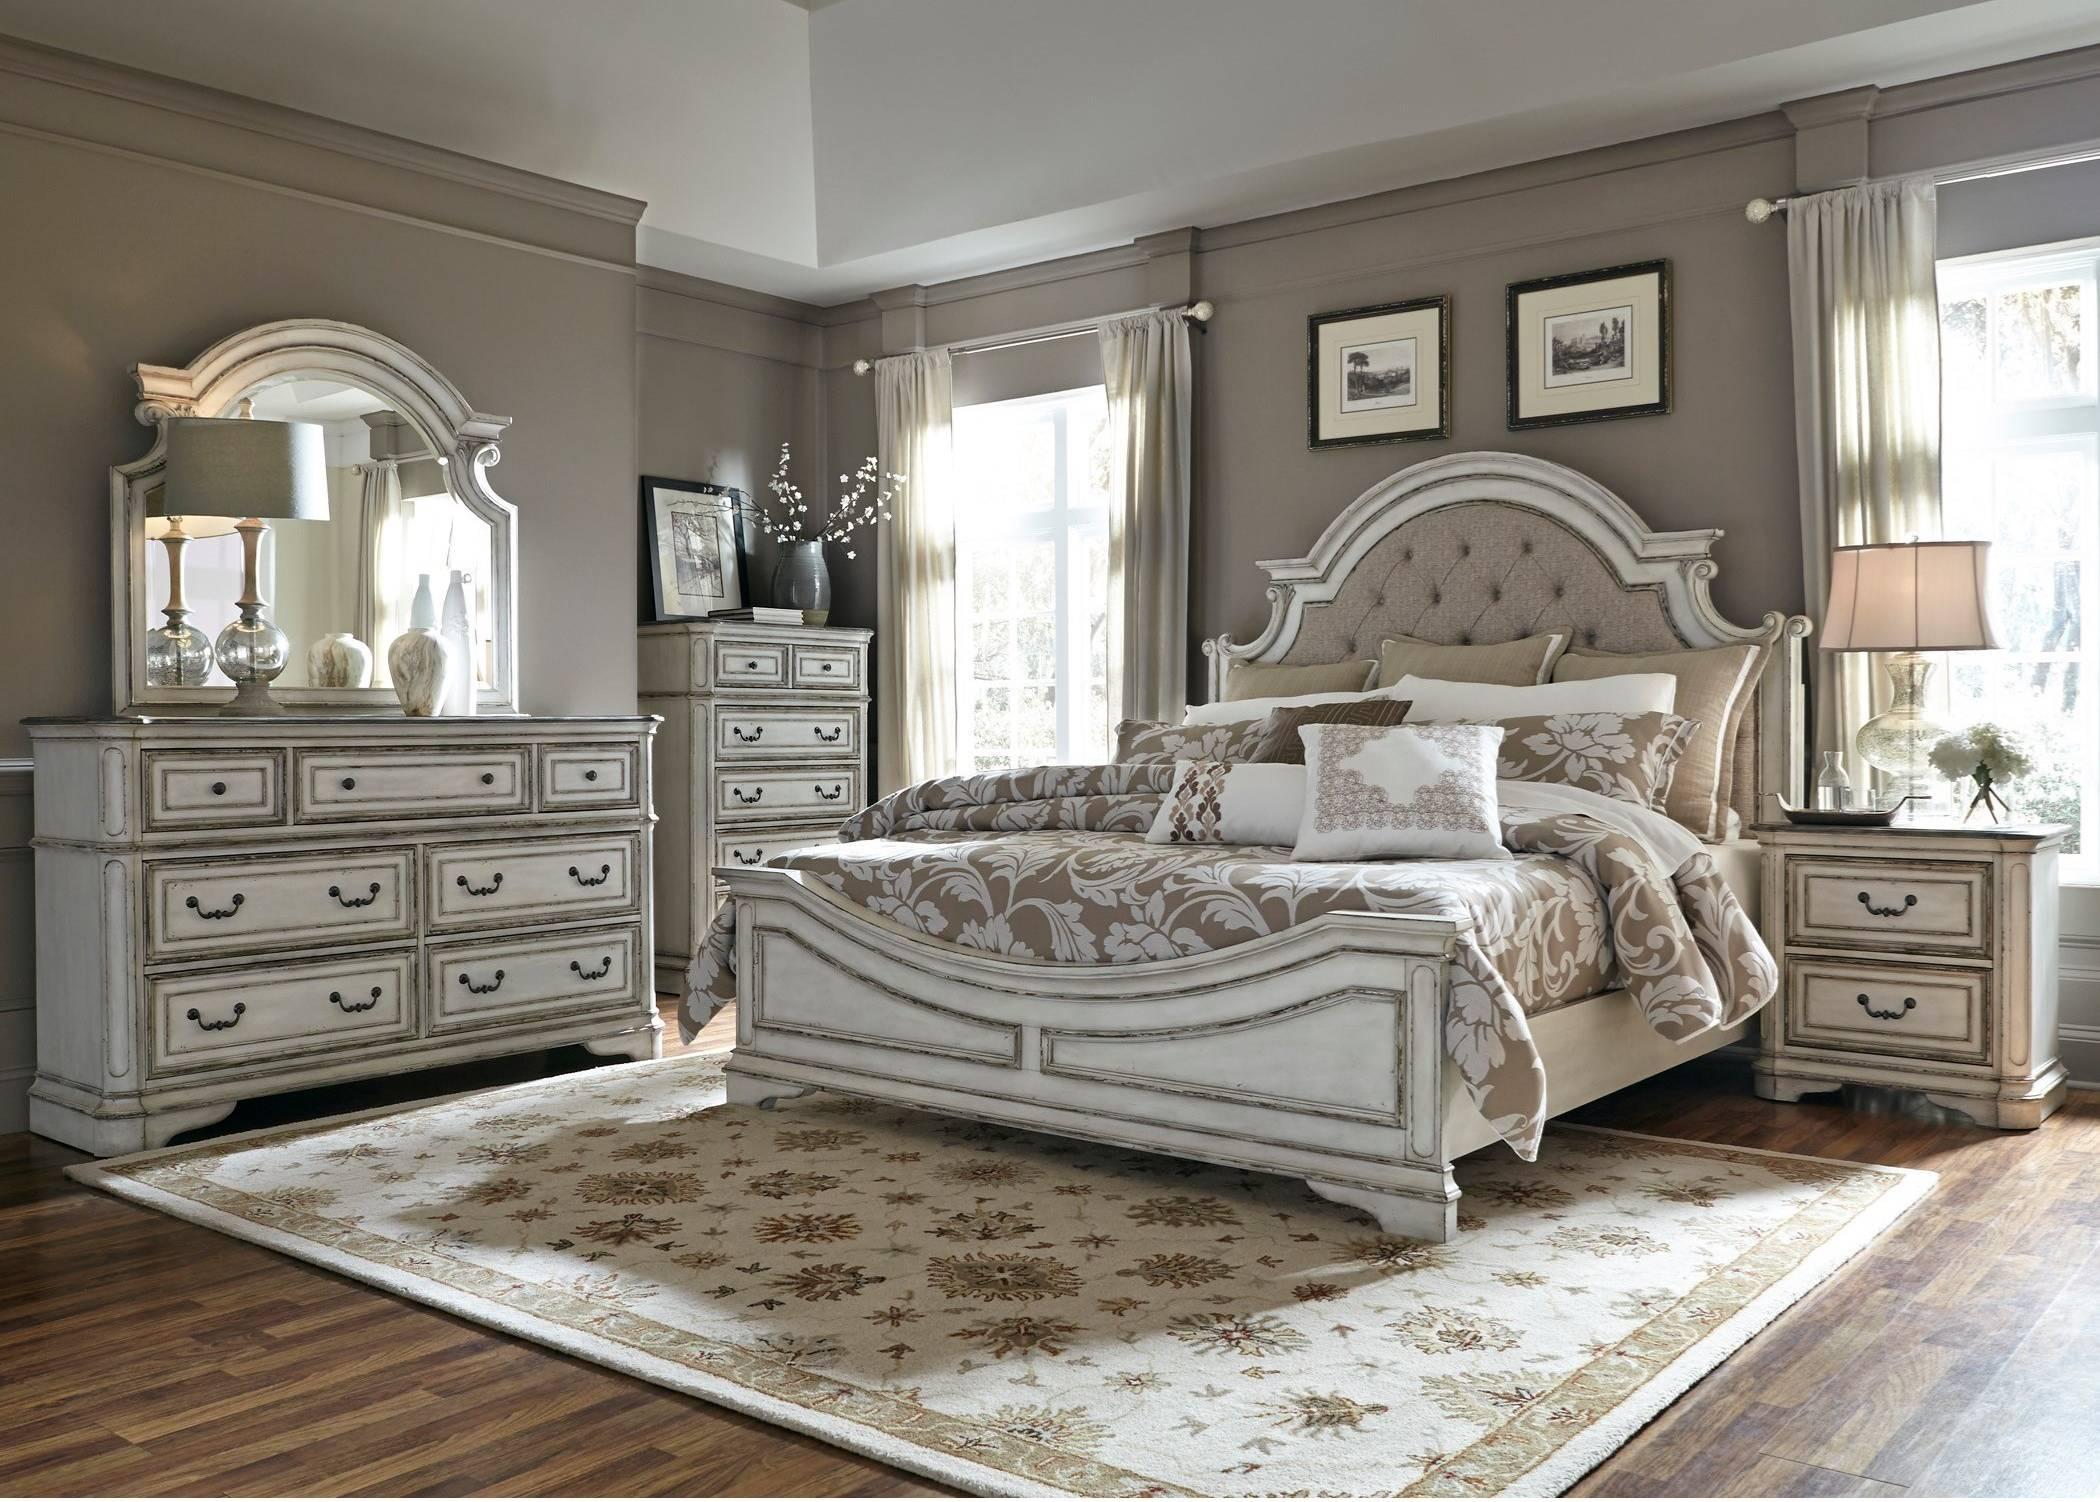 244 Magnolia Manor Queen Upholstered Bed Set  $1999